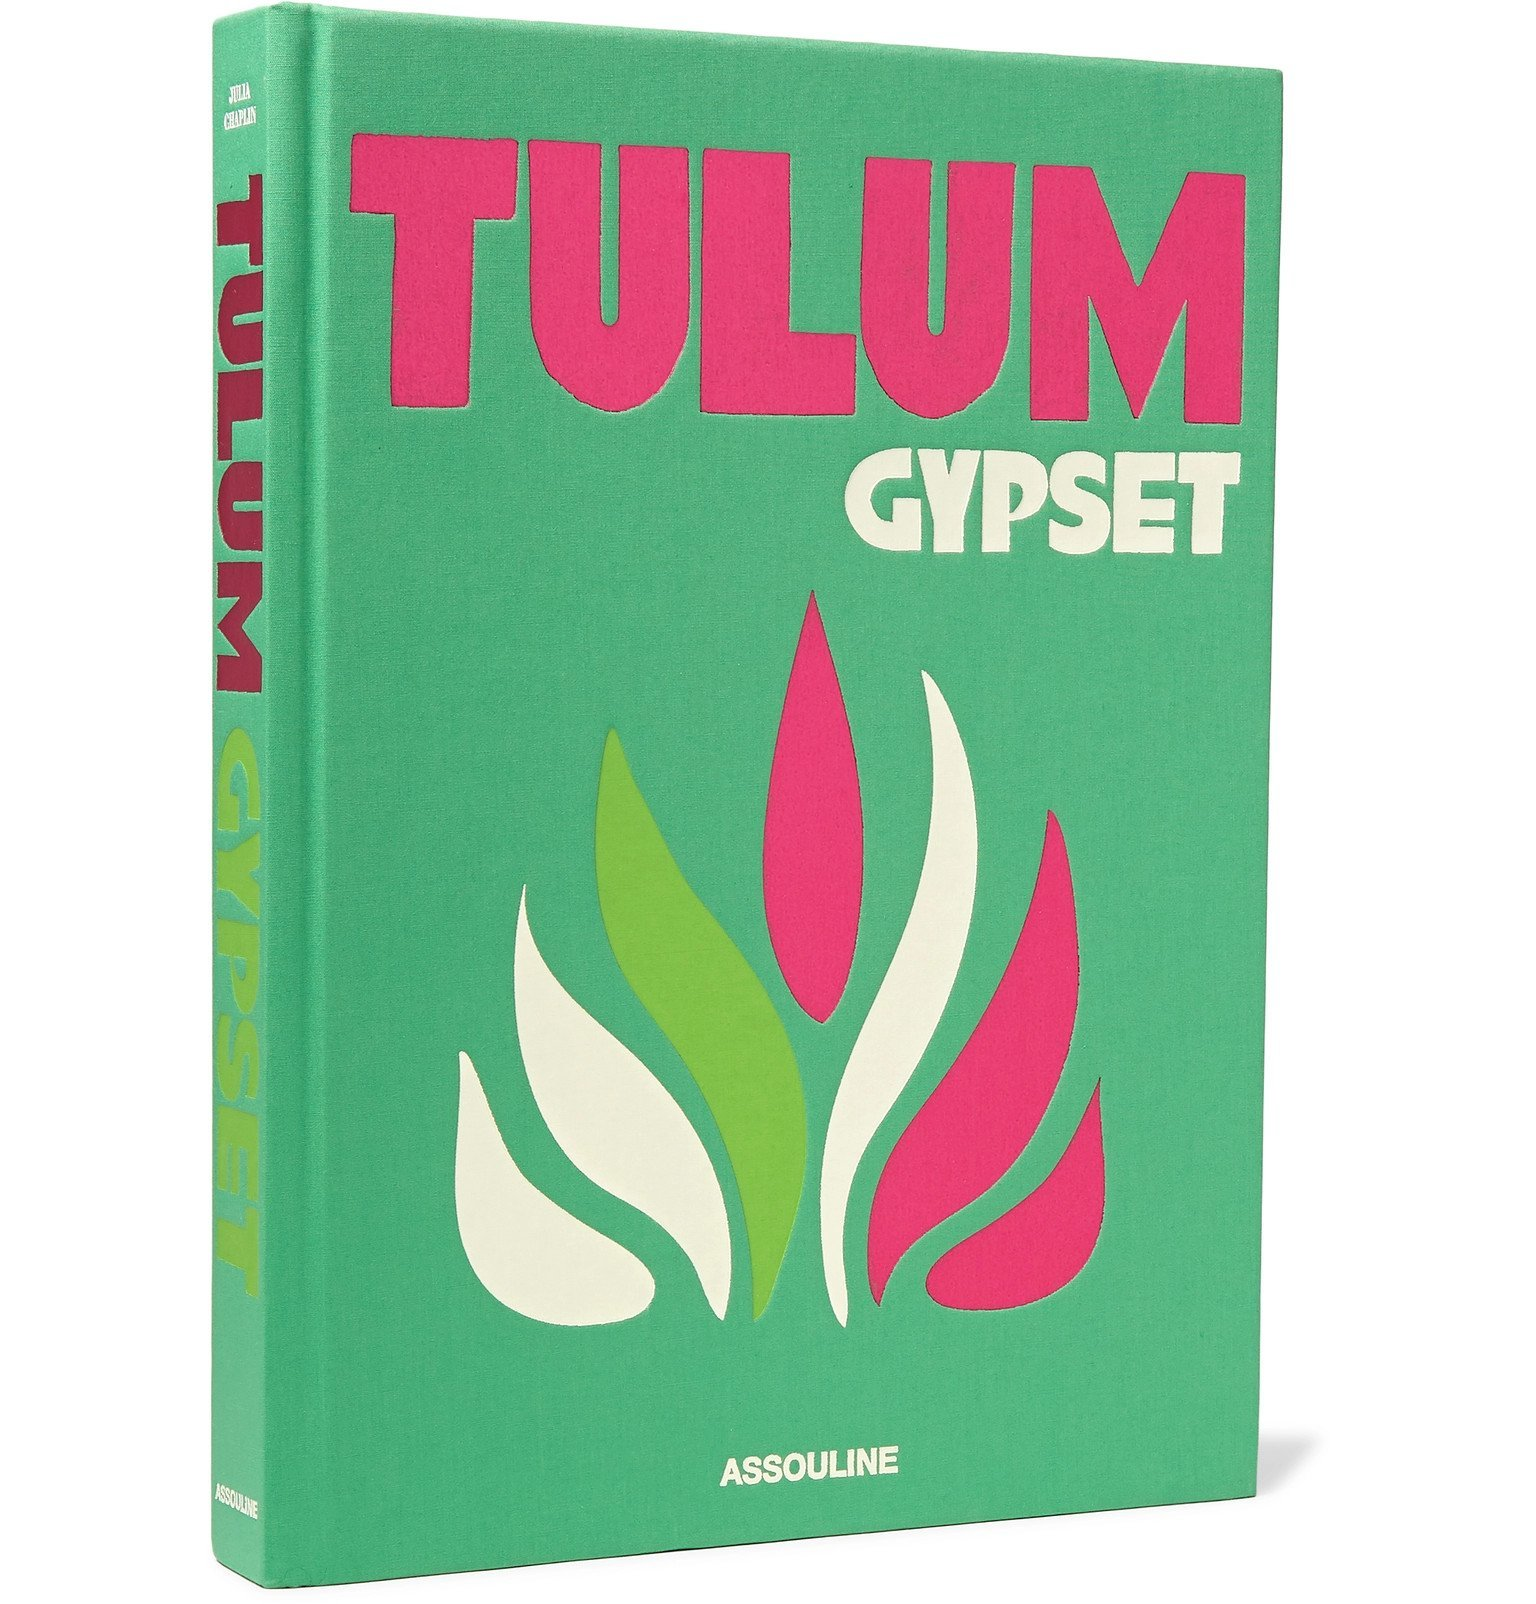 Photo: Assouline - Tulum Gypset Hardcover Book - Green